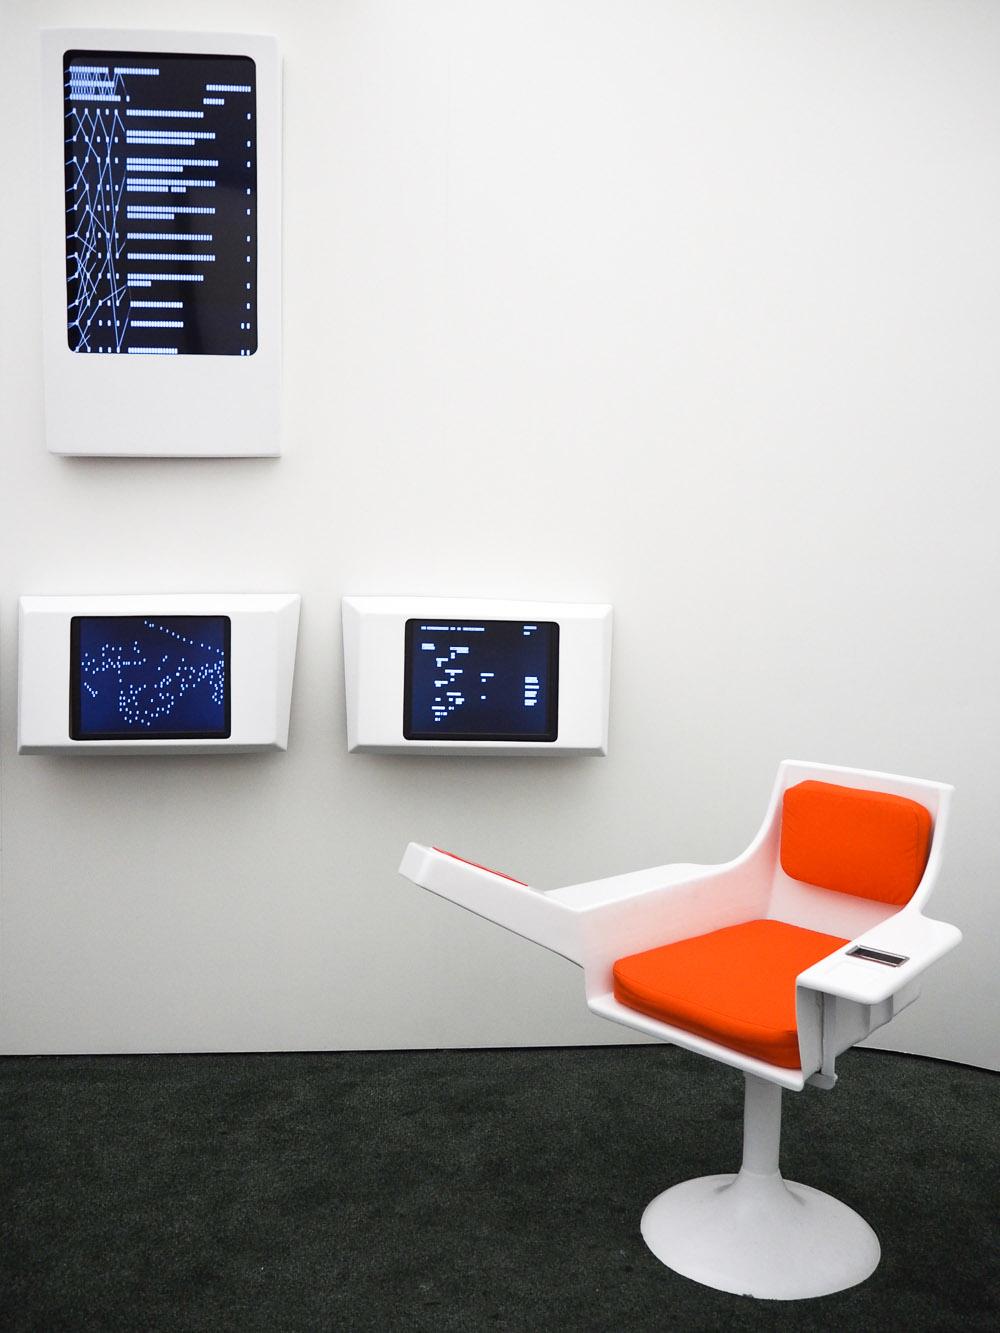 Chile at the London Design Biennale | Design Hunter